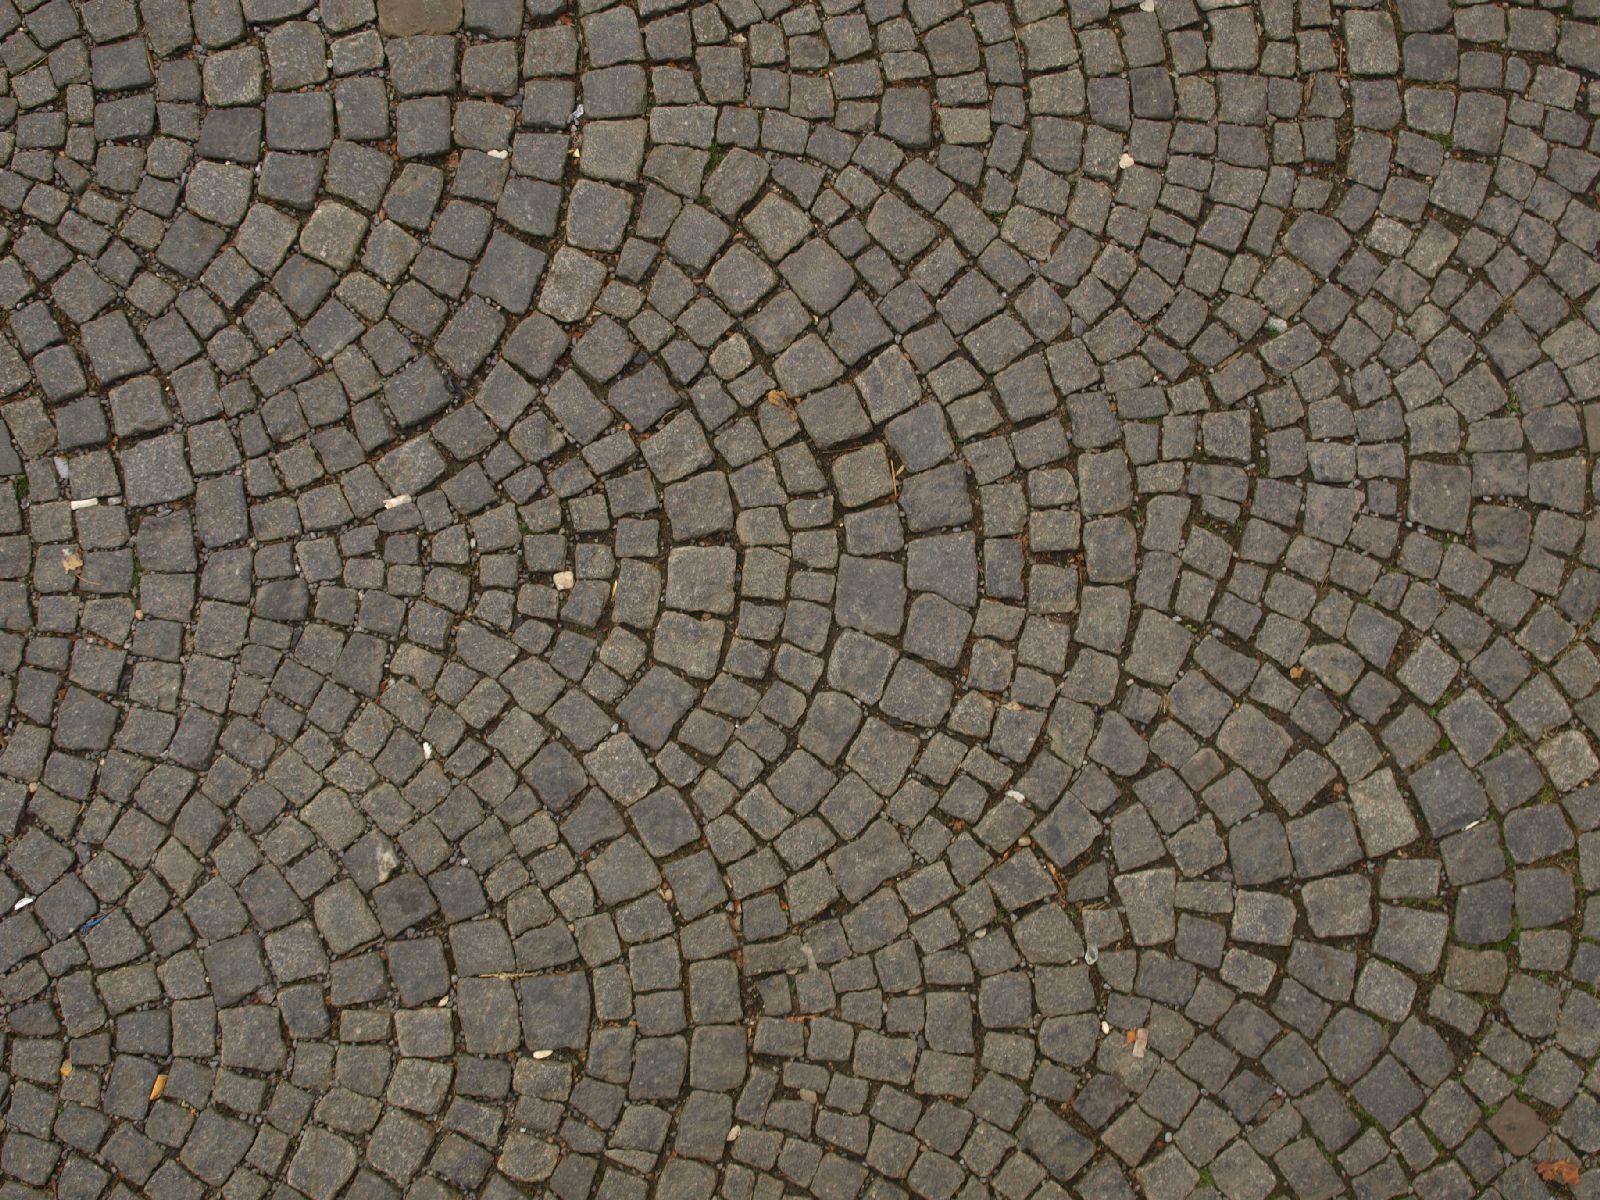 Boden-Gehweg-Strasse-Buergersteig-Textur_A_PA260558